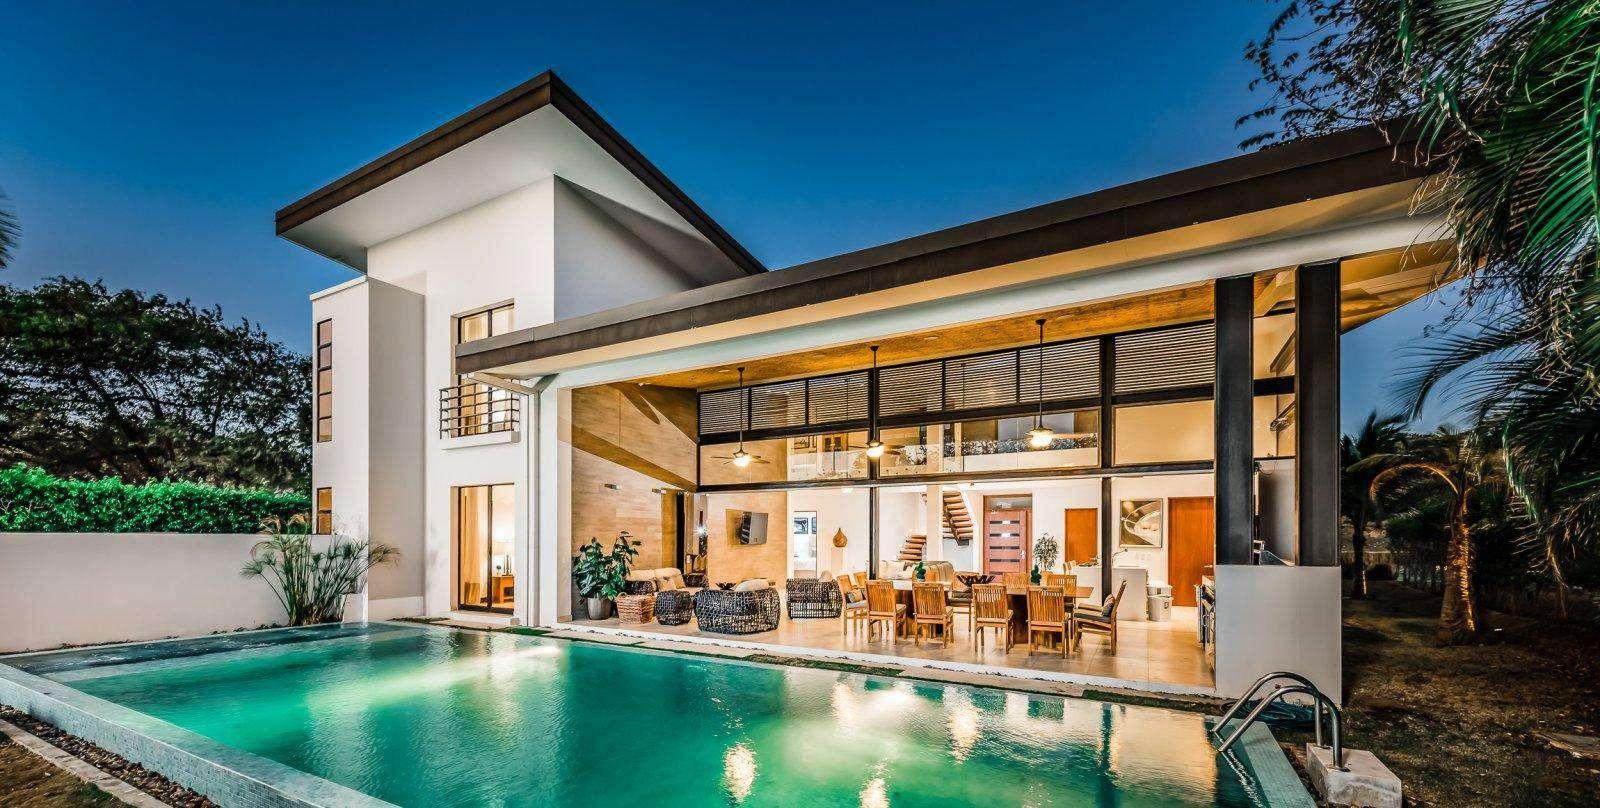 Casa Moderna, an exclusive luxury resort home - property